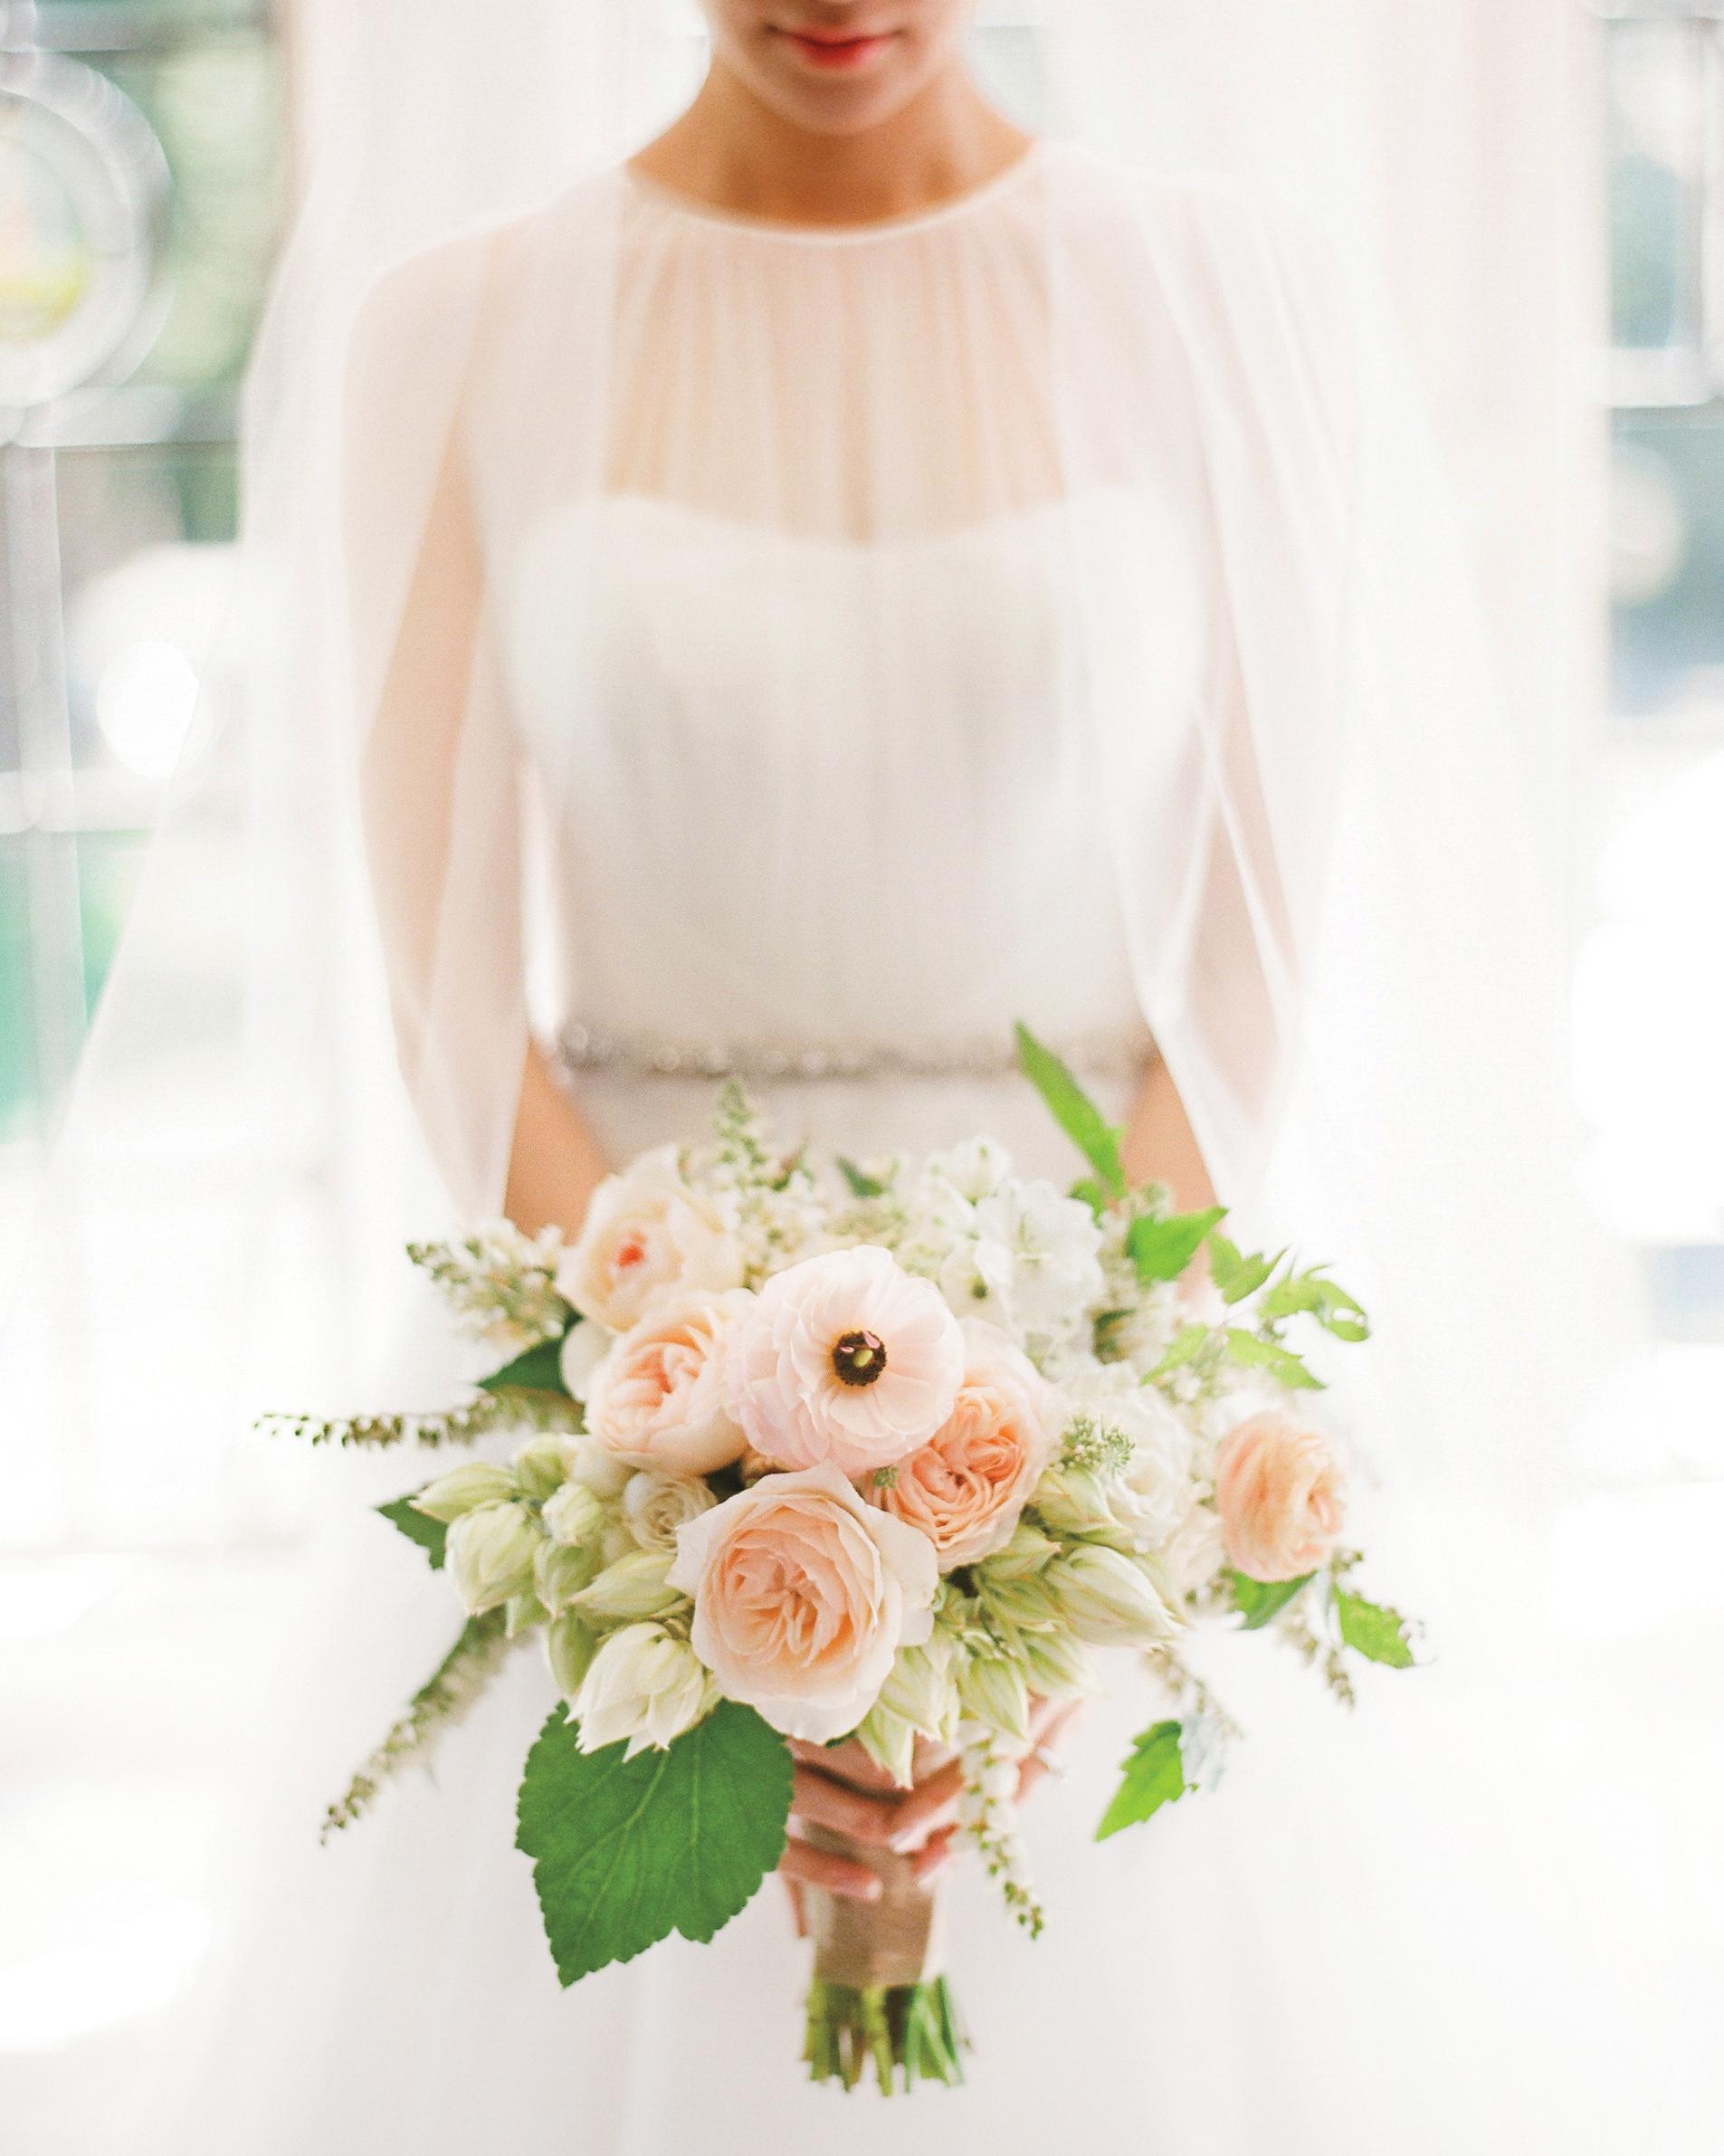 bride-bouquet-2013-08-31-bomibilly-0114-mwds110832.jpg